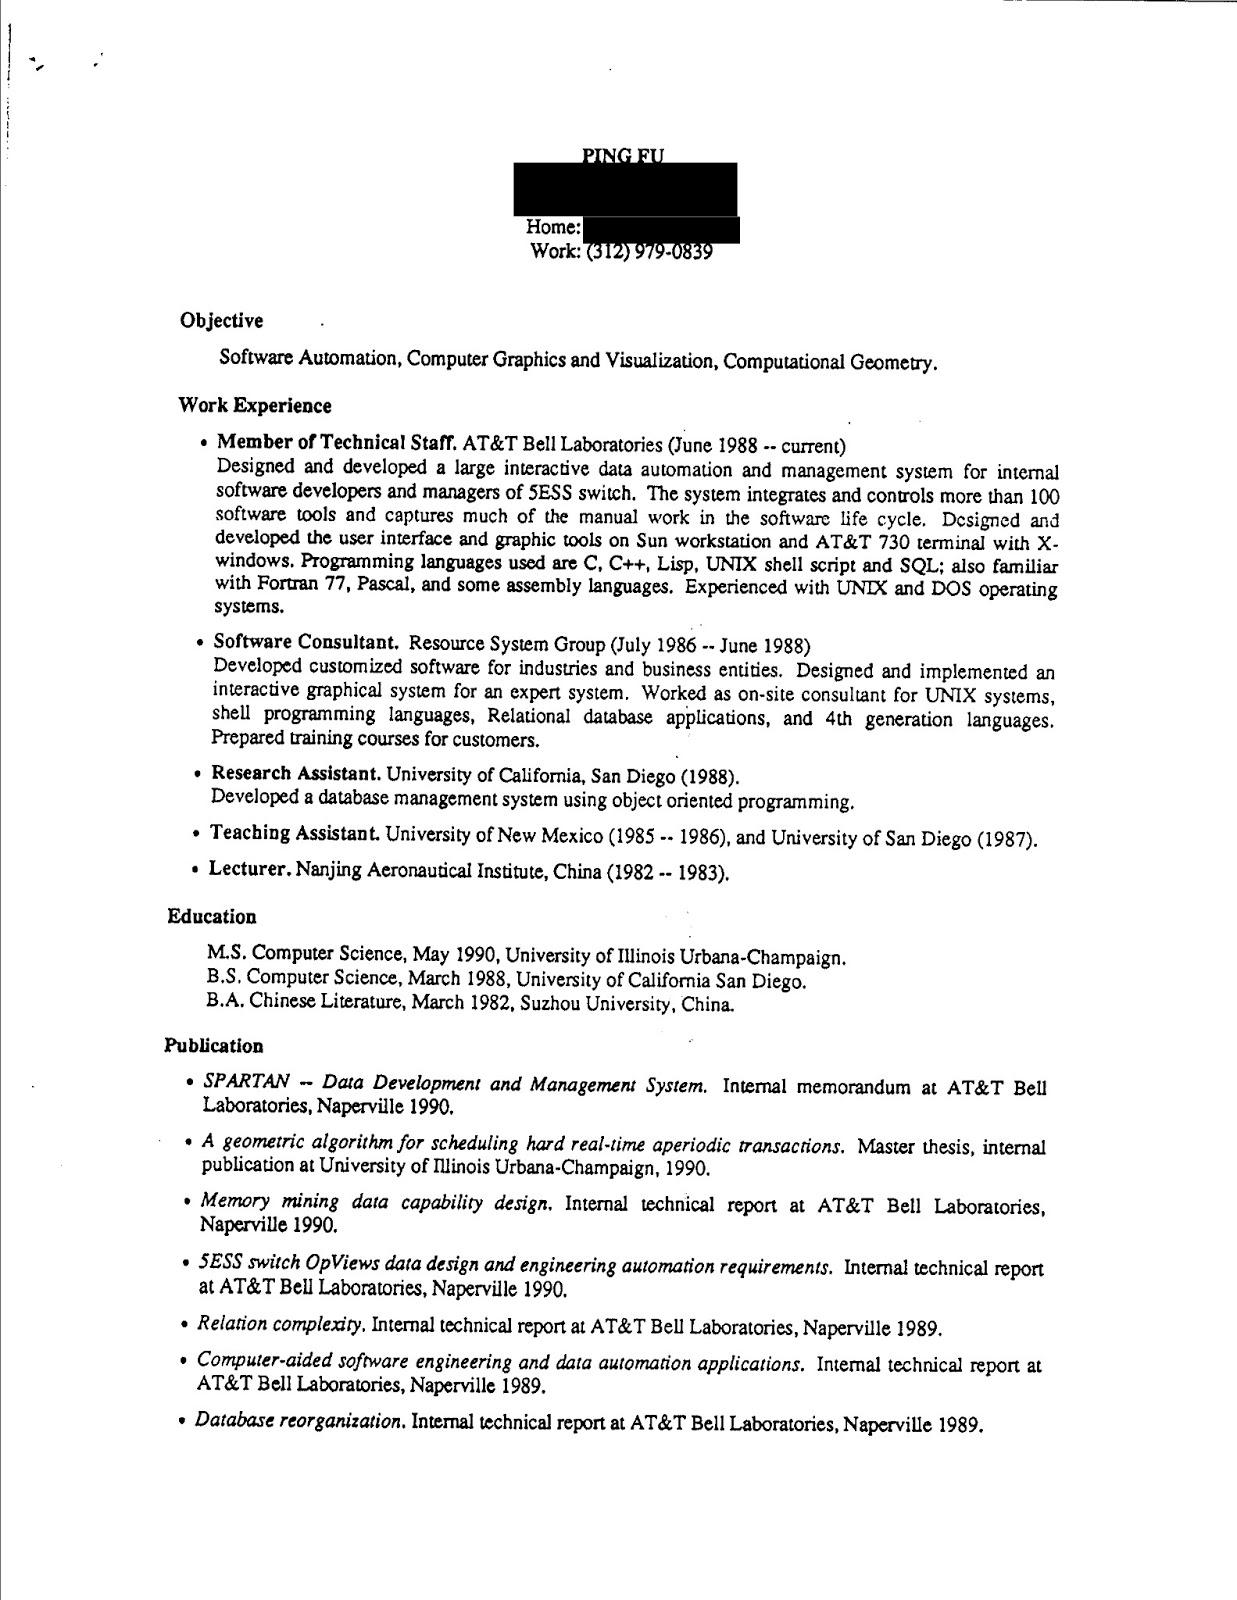 debunking bend not break document fu ping s resume at university